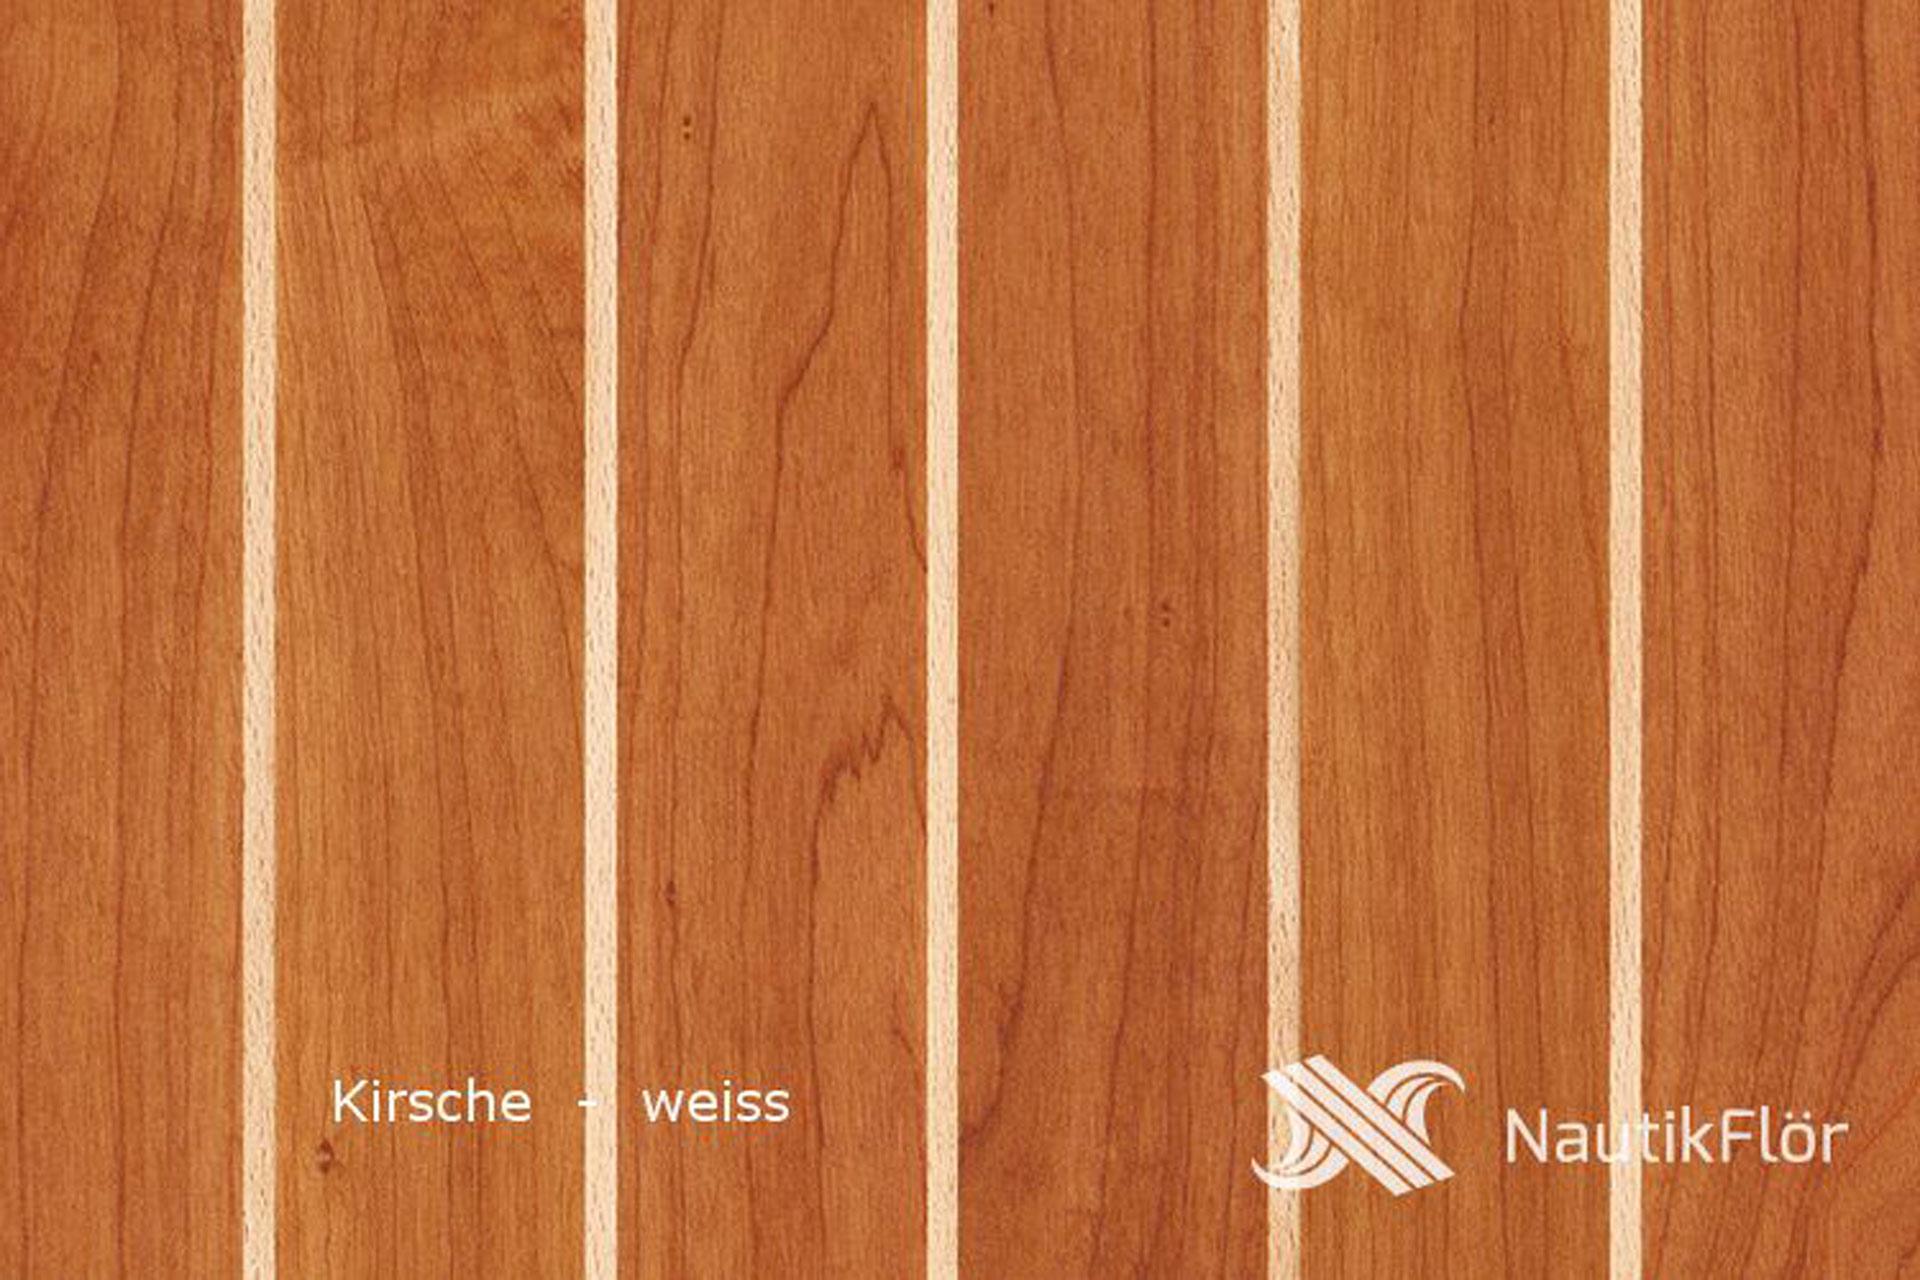 Fußbodenbelag Klick Vinyl ~ Nautikflör fußboden click vinyl innenbereich bodenbelag